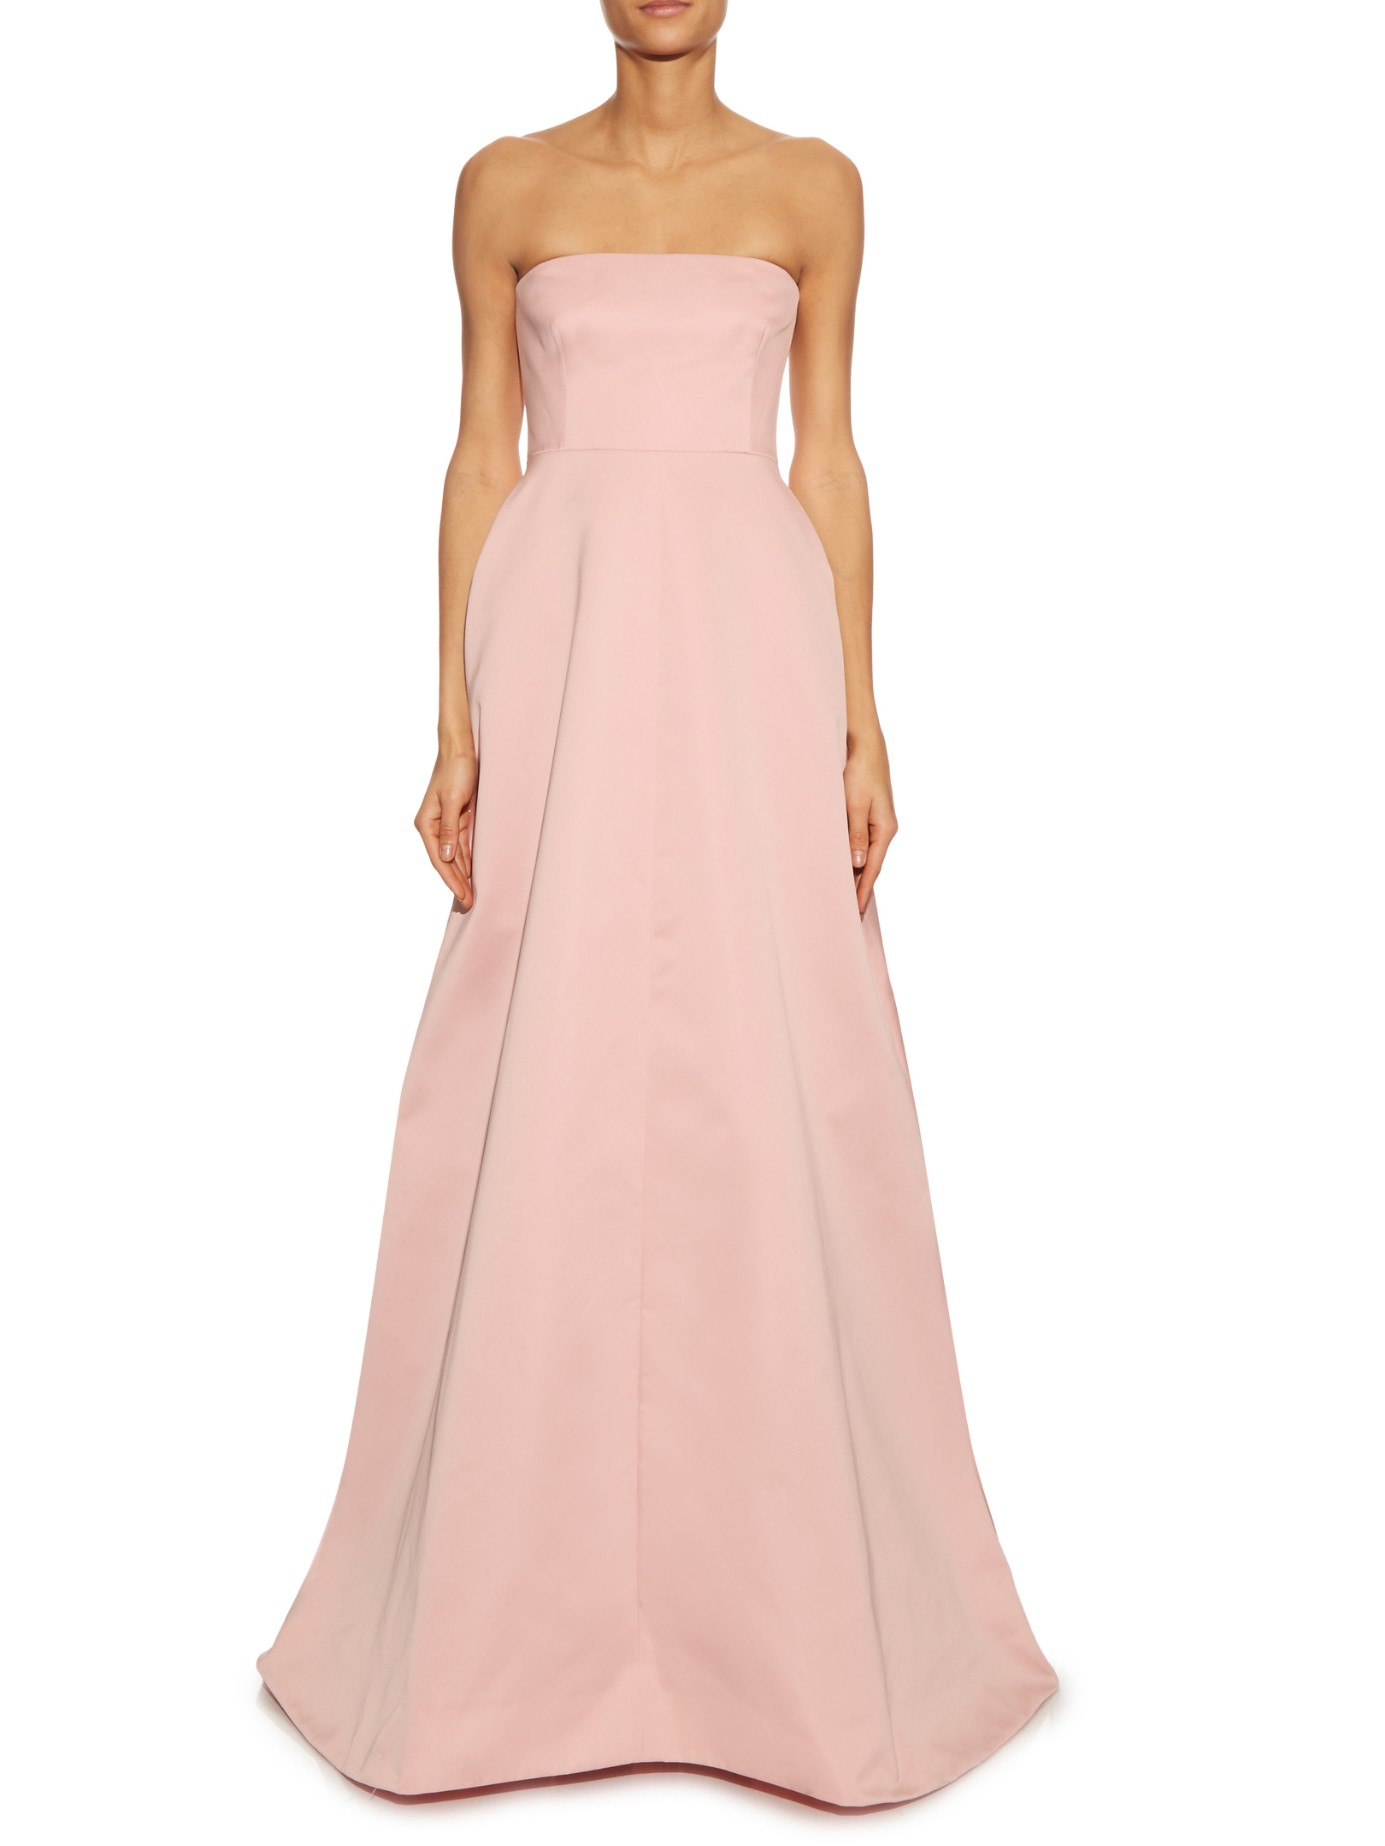 Cheap Low Price Hot Sale Sale Online empire gown - Pink & Purple Rochas aTm4CeK